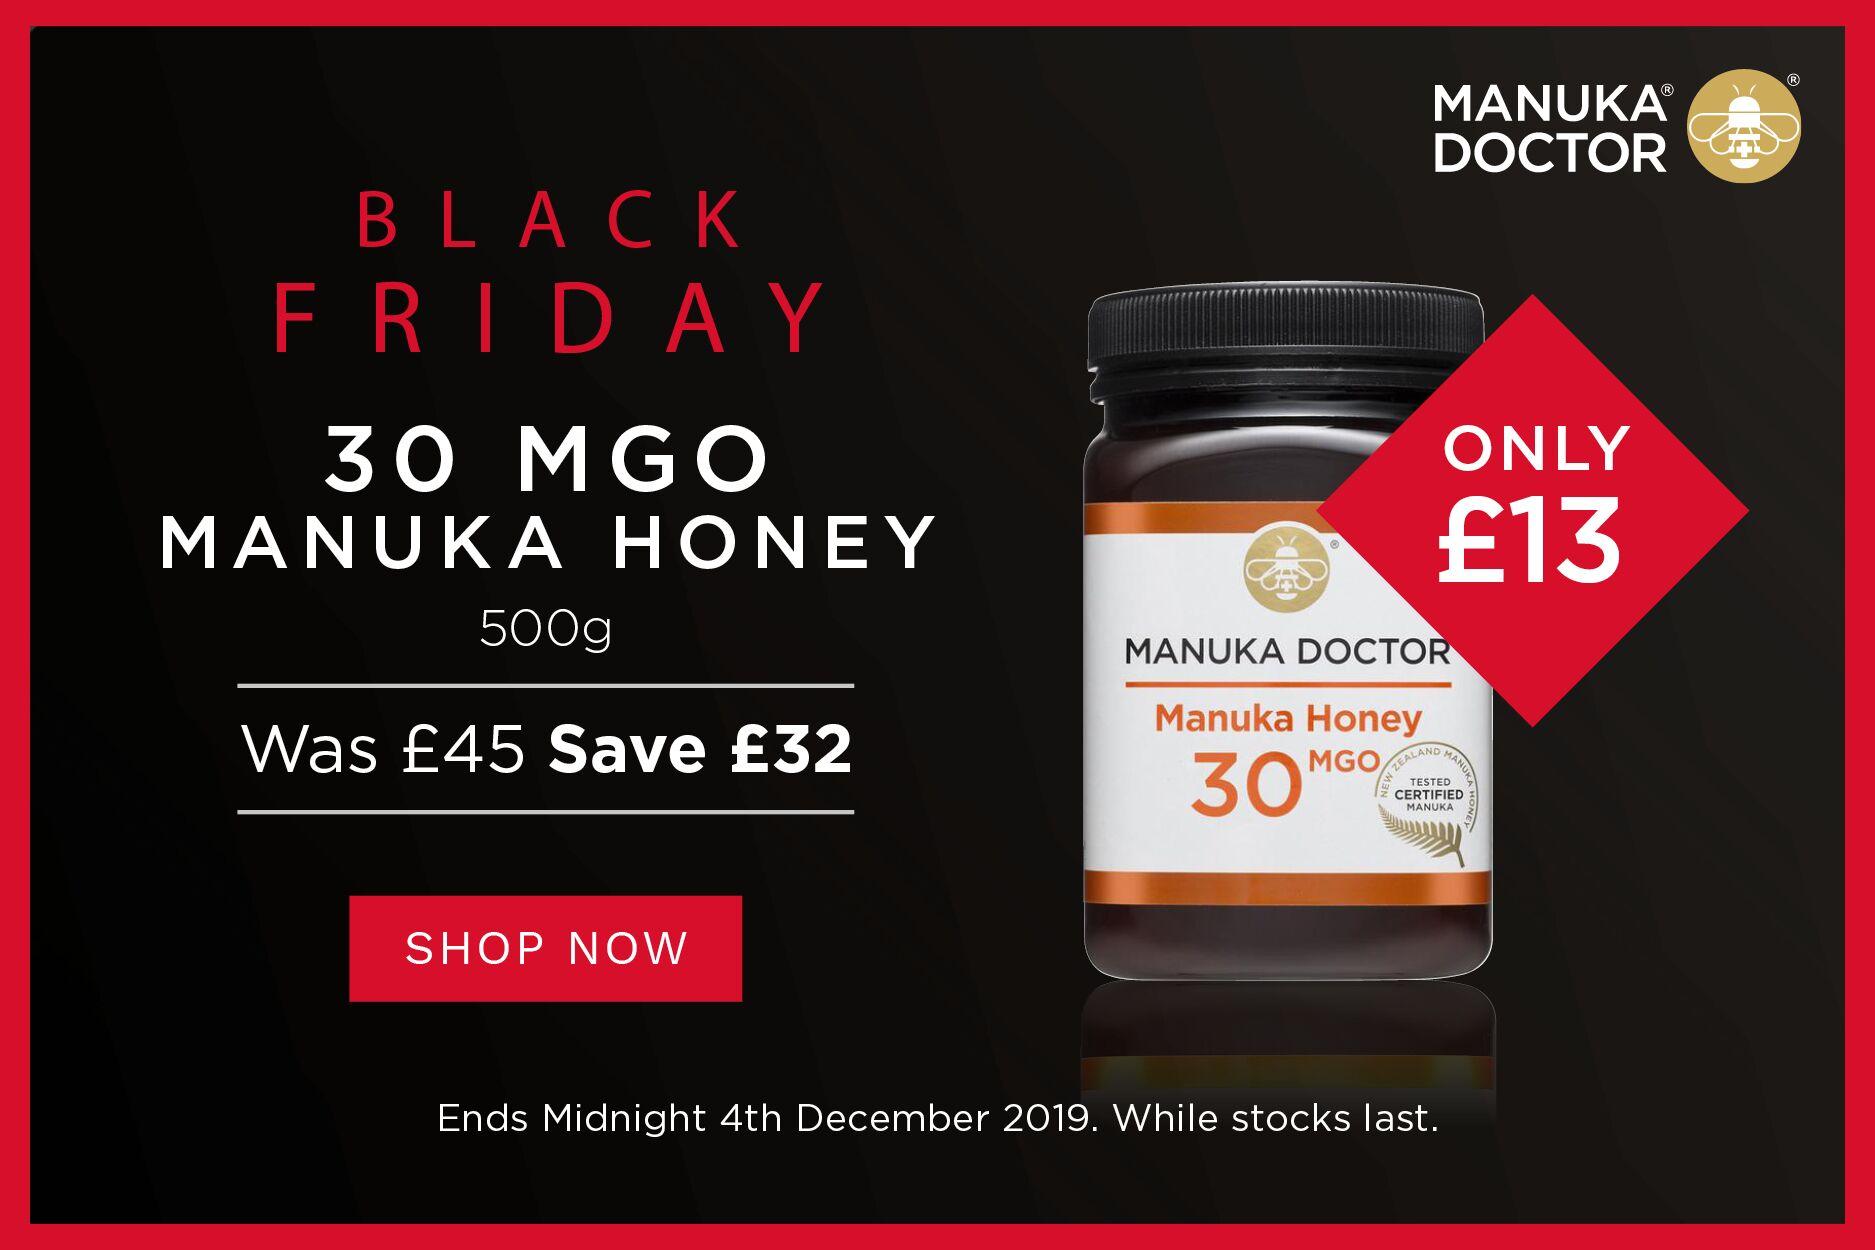 Manuka Doctor麦卢卡 | 养胃蜂蜜500g大罐装闪销28折,只要13镑